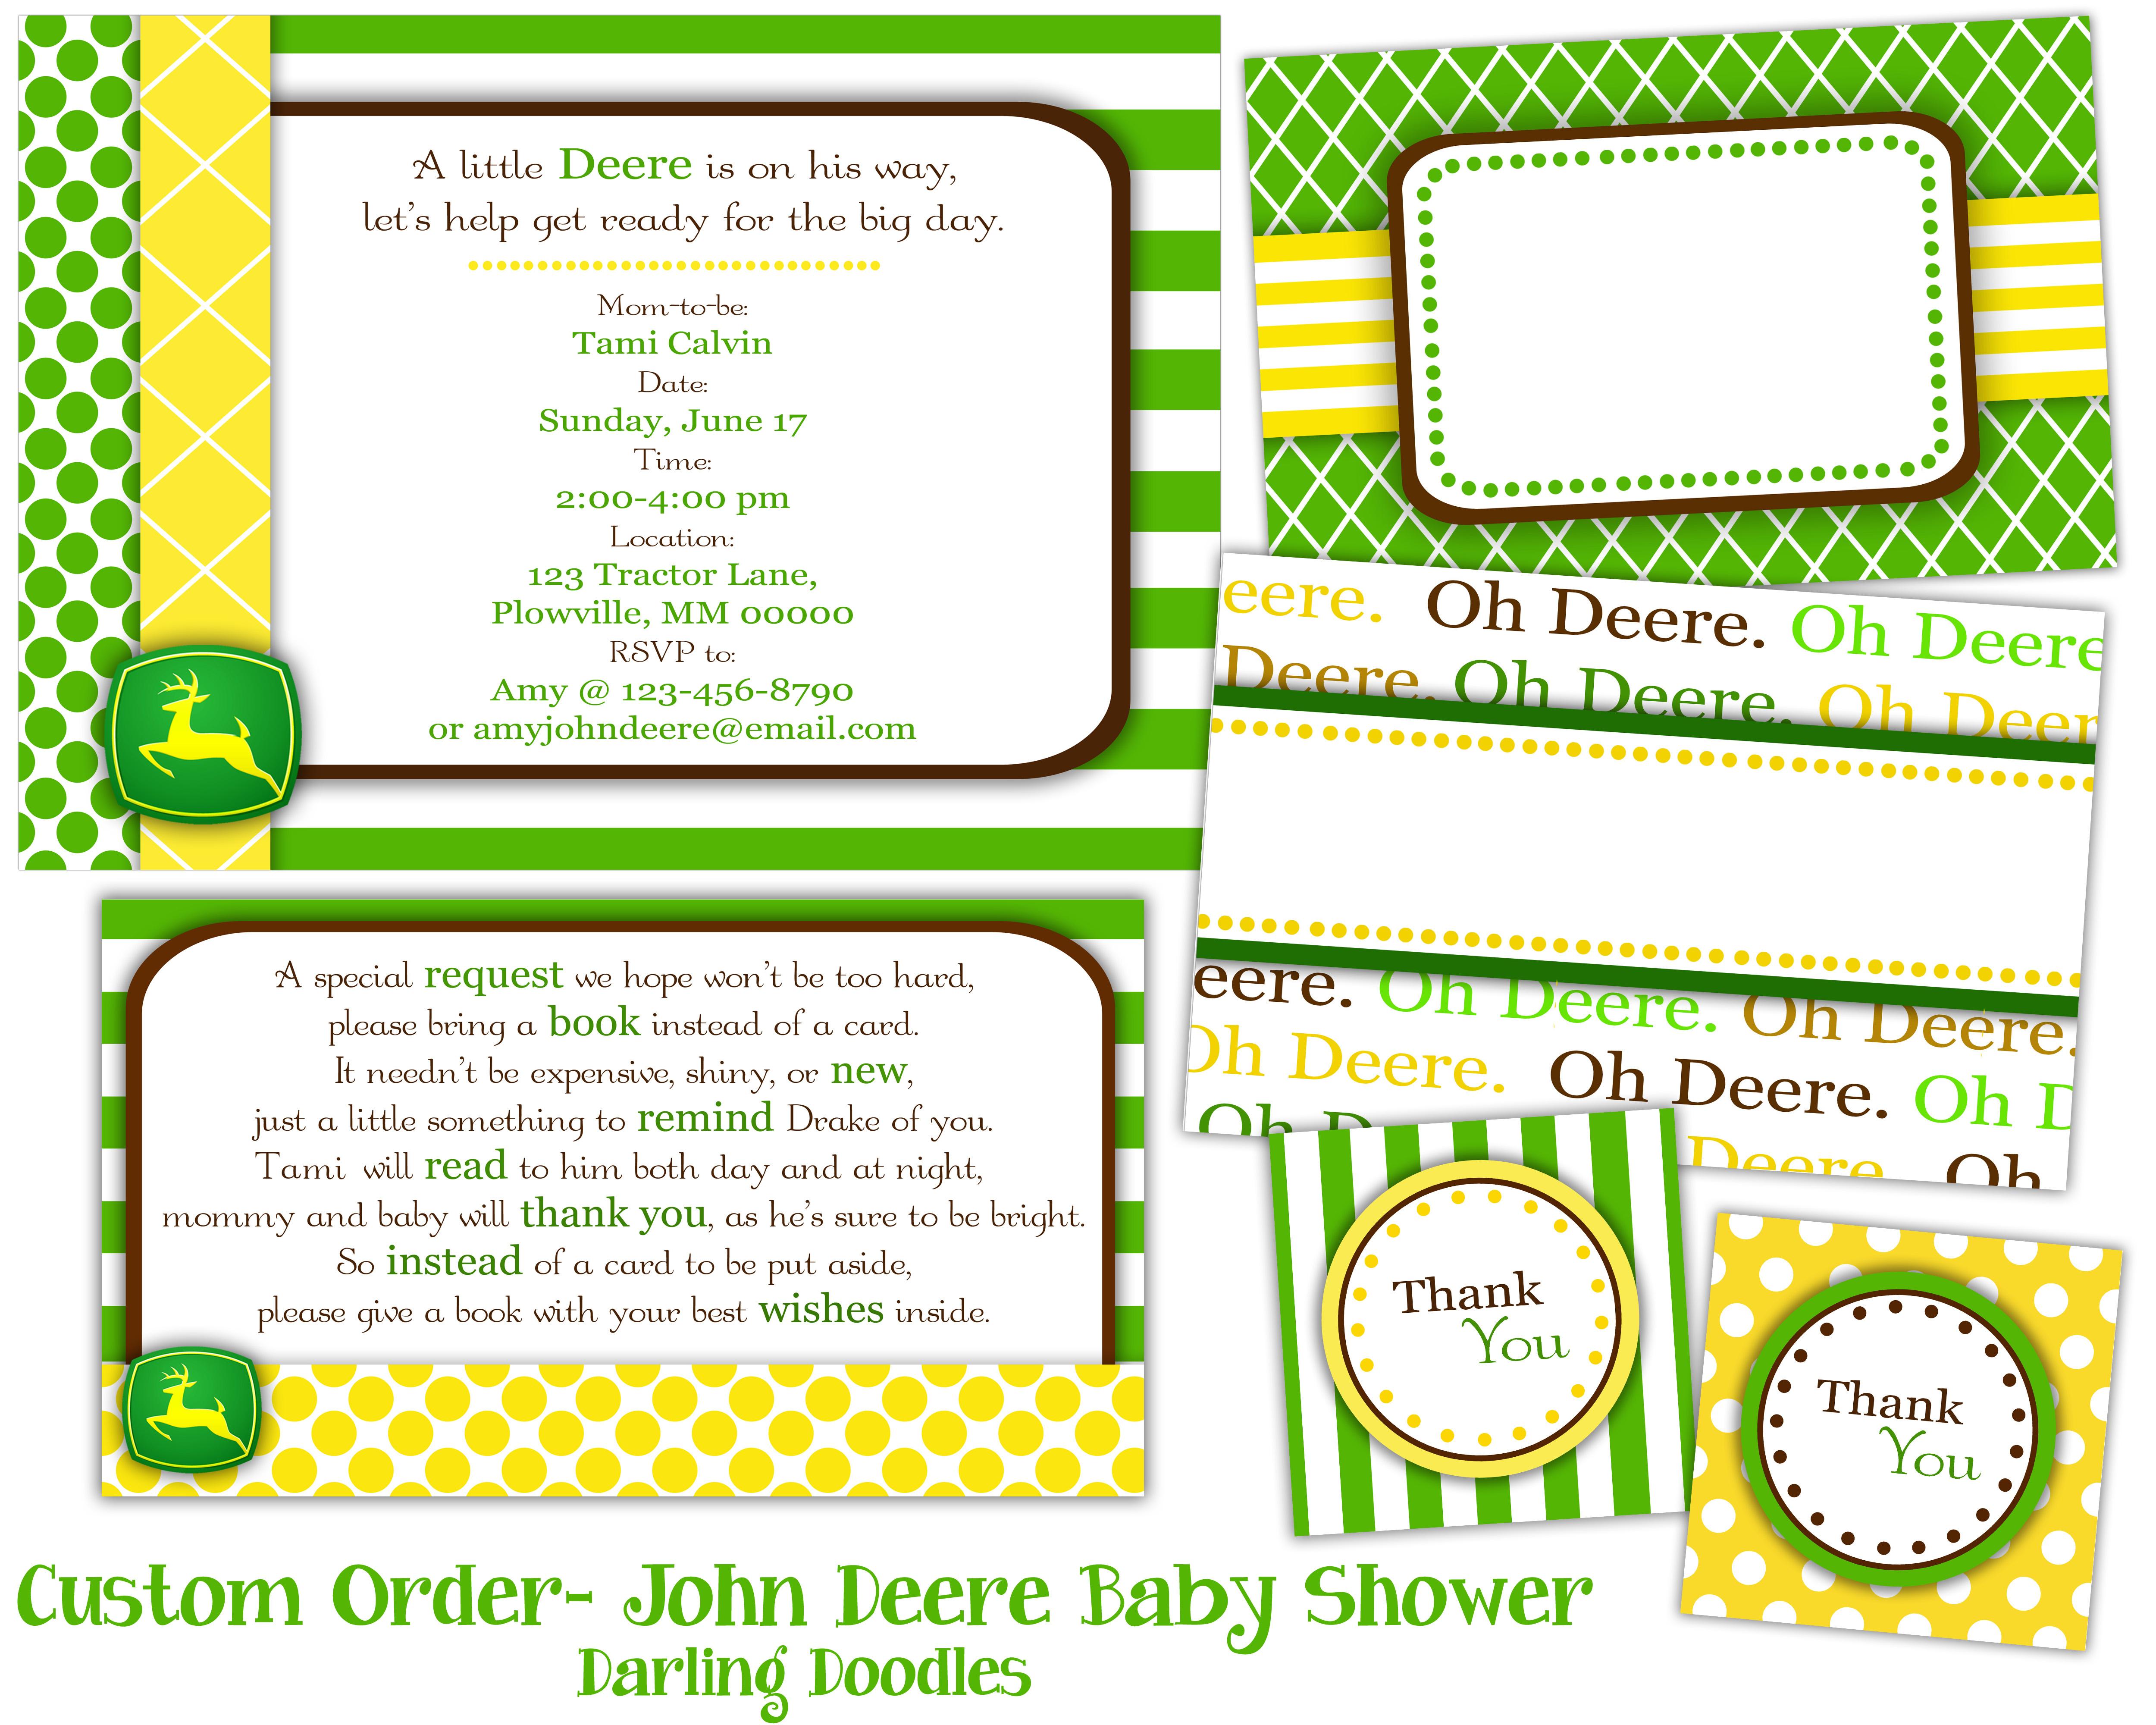 John Deere Baby Shower Invitations For Free | Shilohmidwifery - Free Printable John Deere Baby Shower Invitations